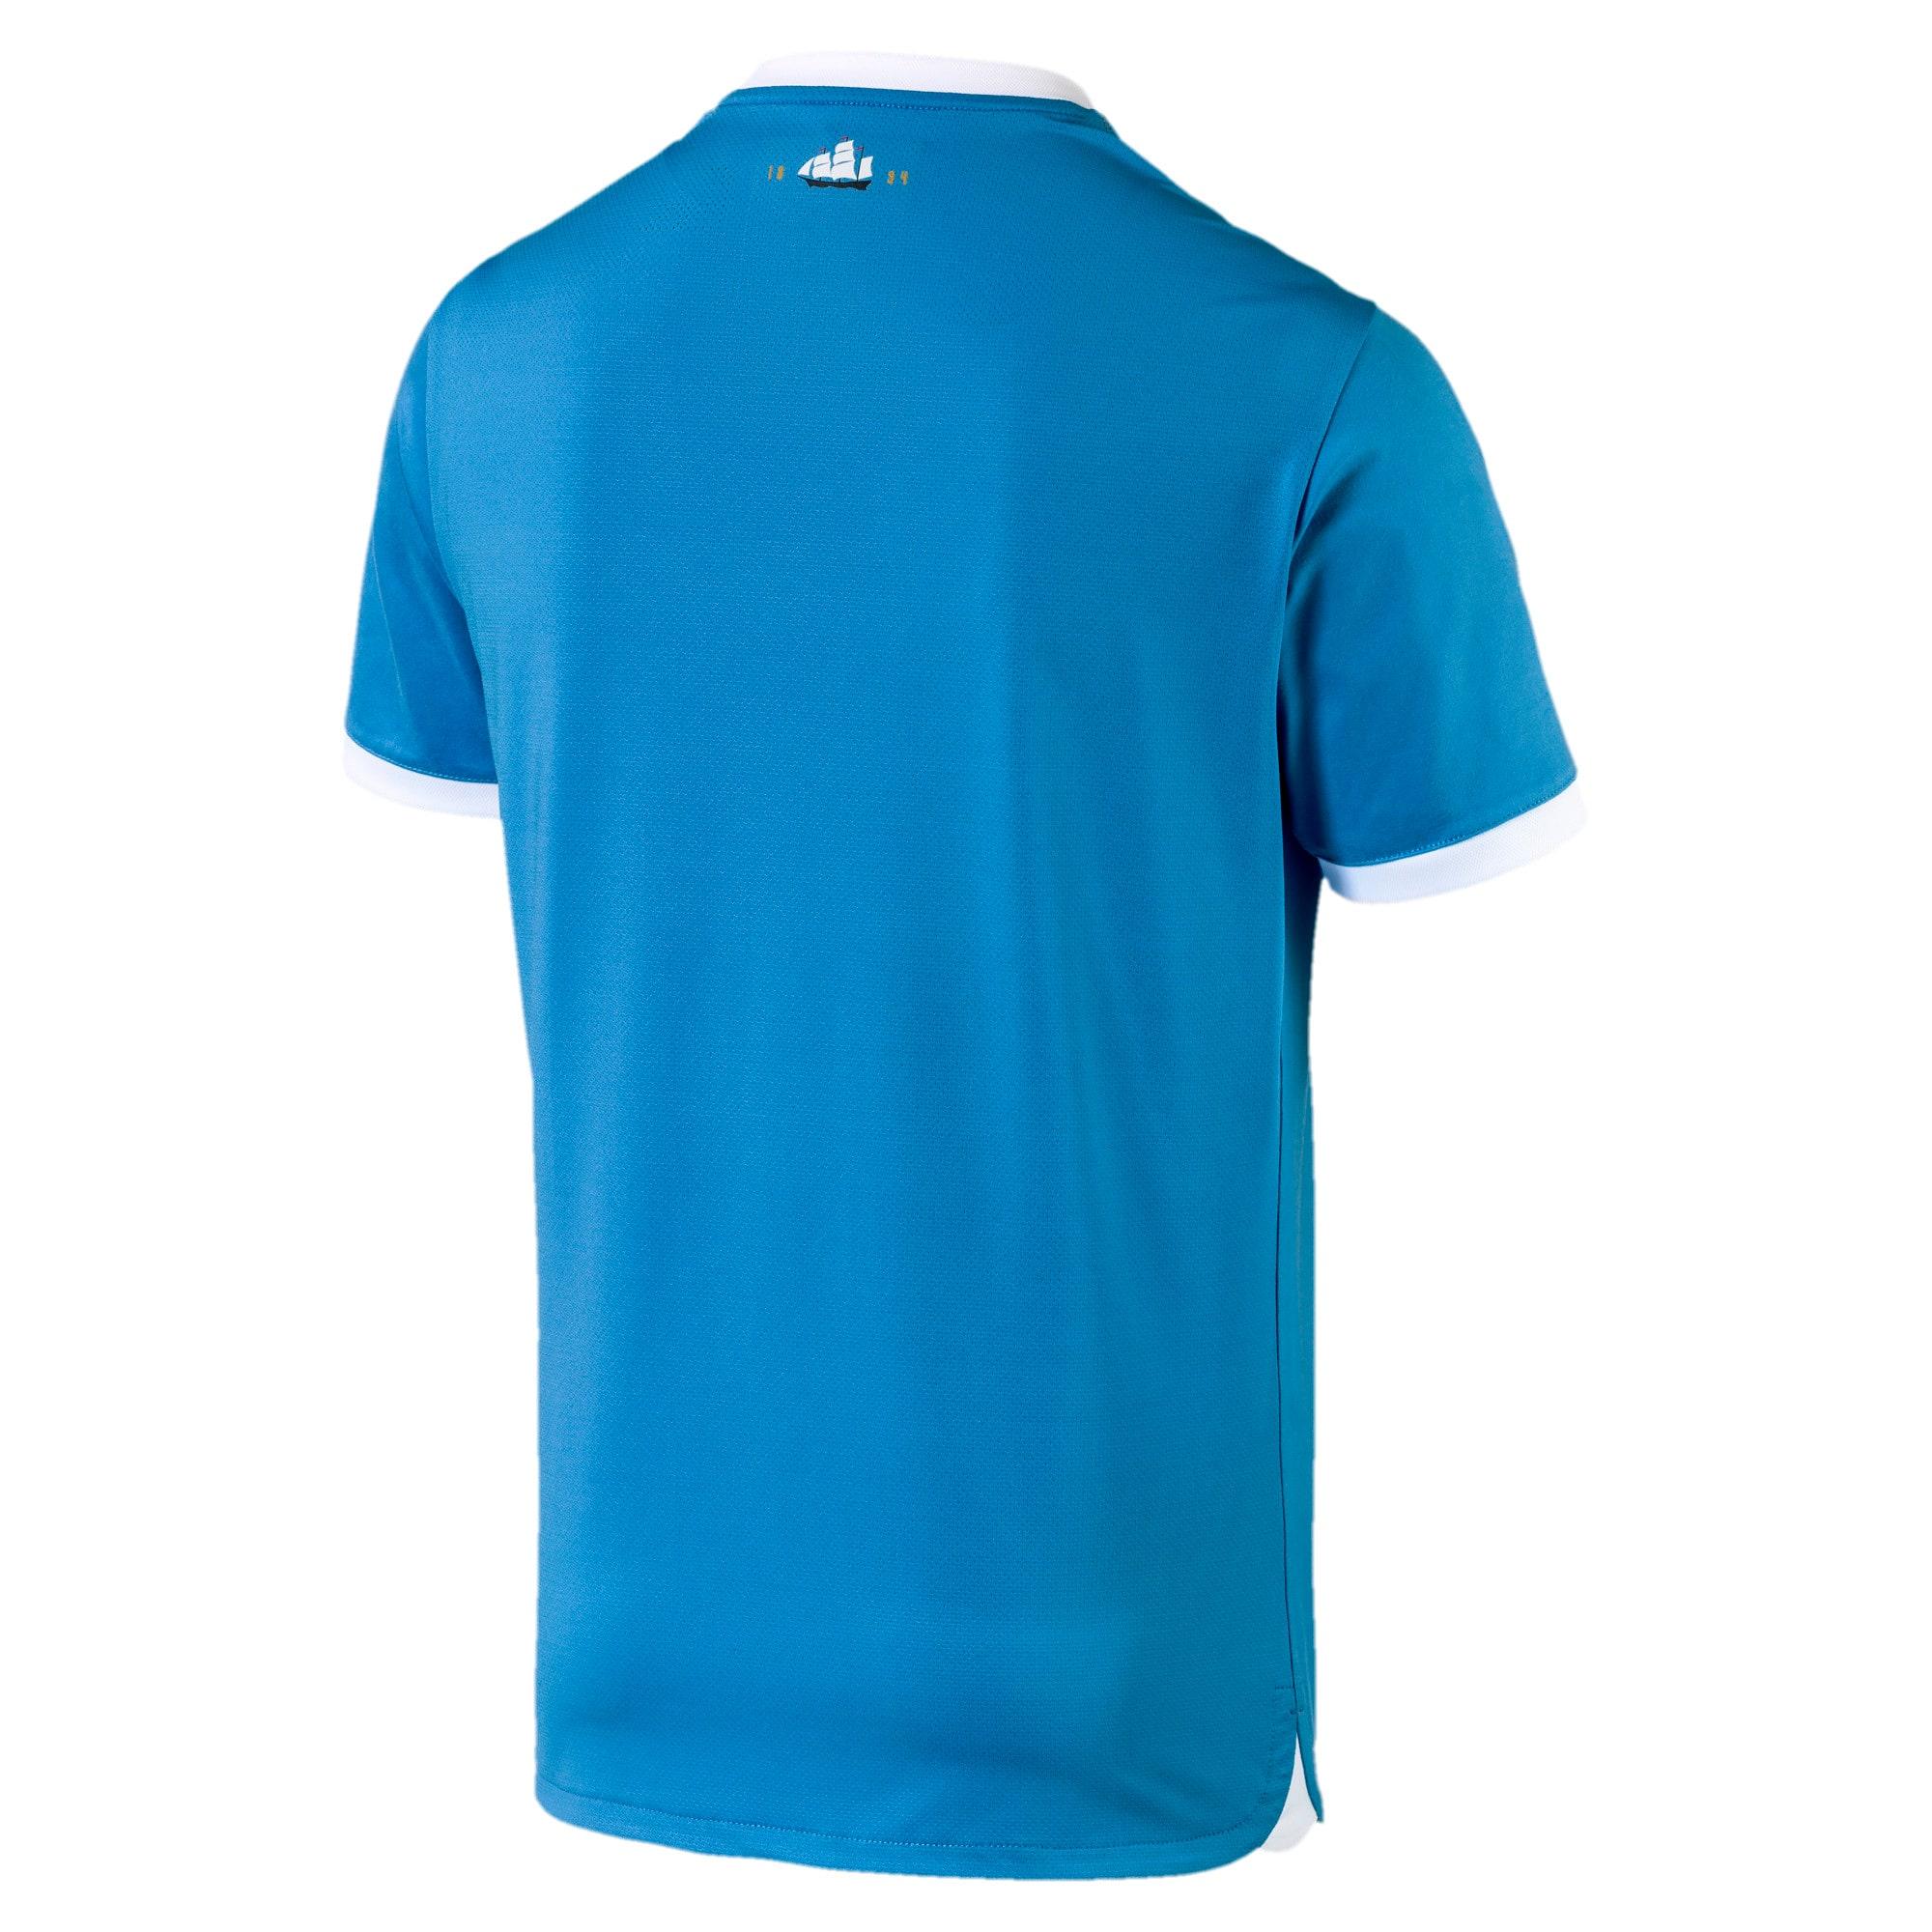 Thumbnail 3 of マンチェスター・シティ MCFC 125th アニバーサリー オーセンティックシャツ ユニフォーム, Marina-Puma White, medium-JPN